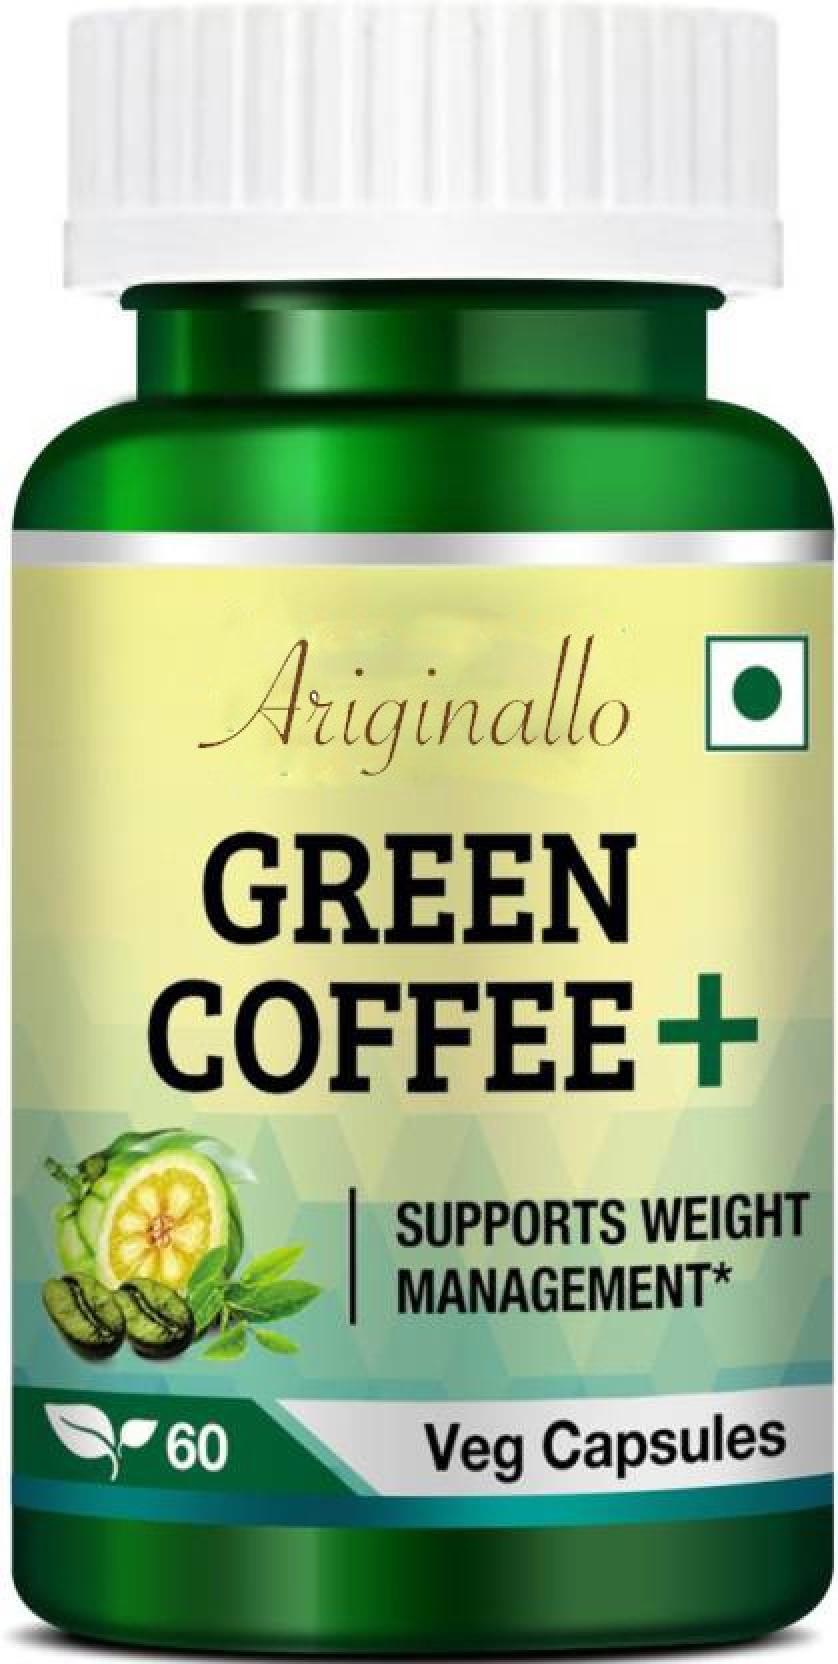 Ariginallo Premium Organic Green Coffee Beans For Weight Loss Price Capsule Pure Arabica 60 Caps Share